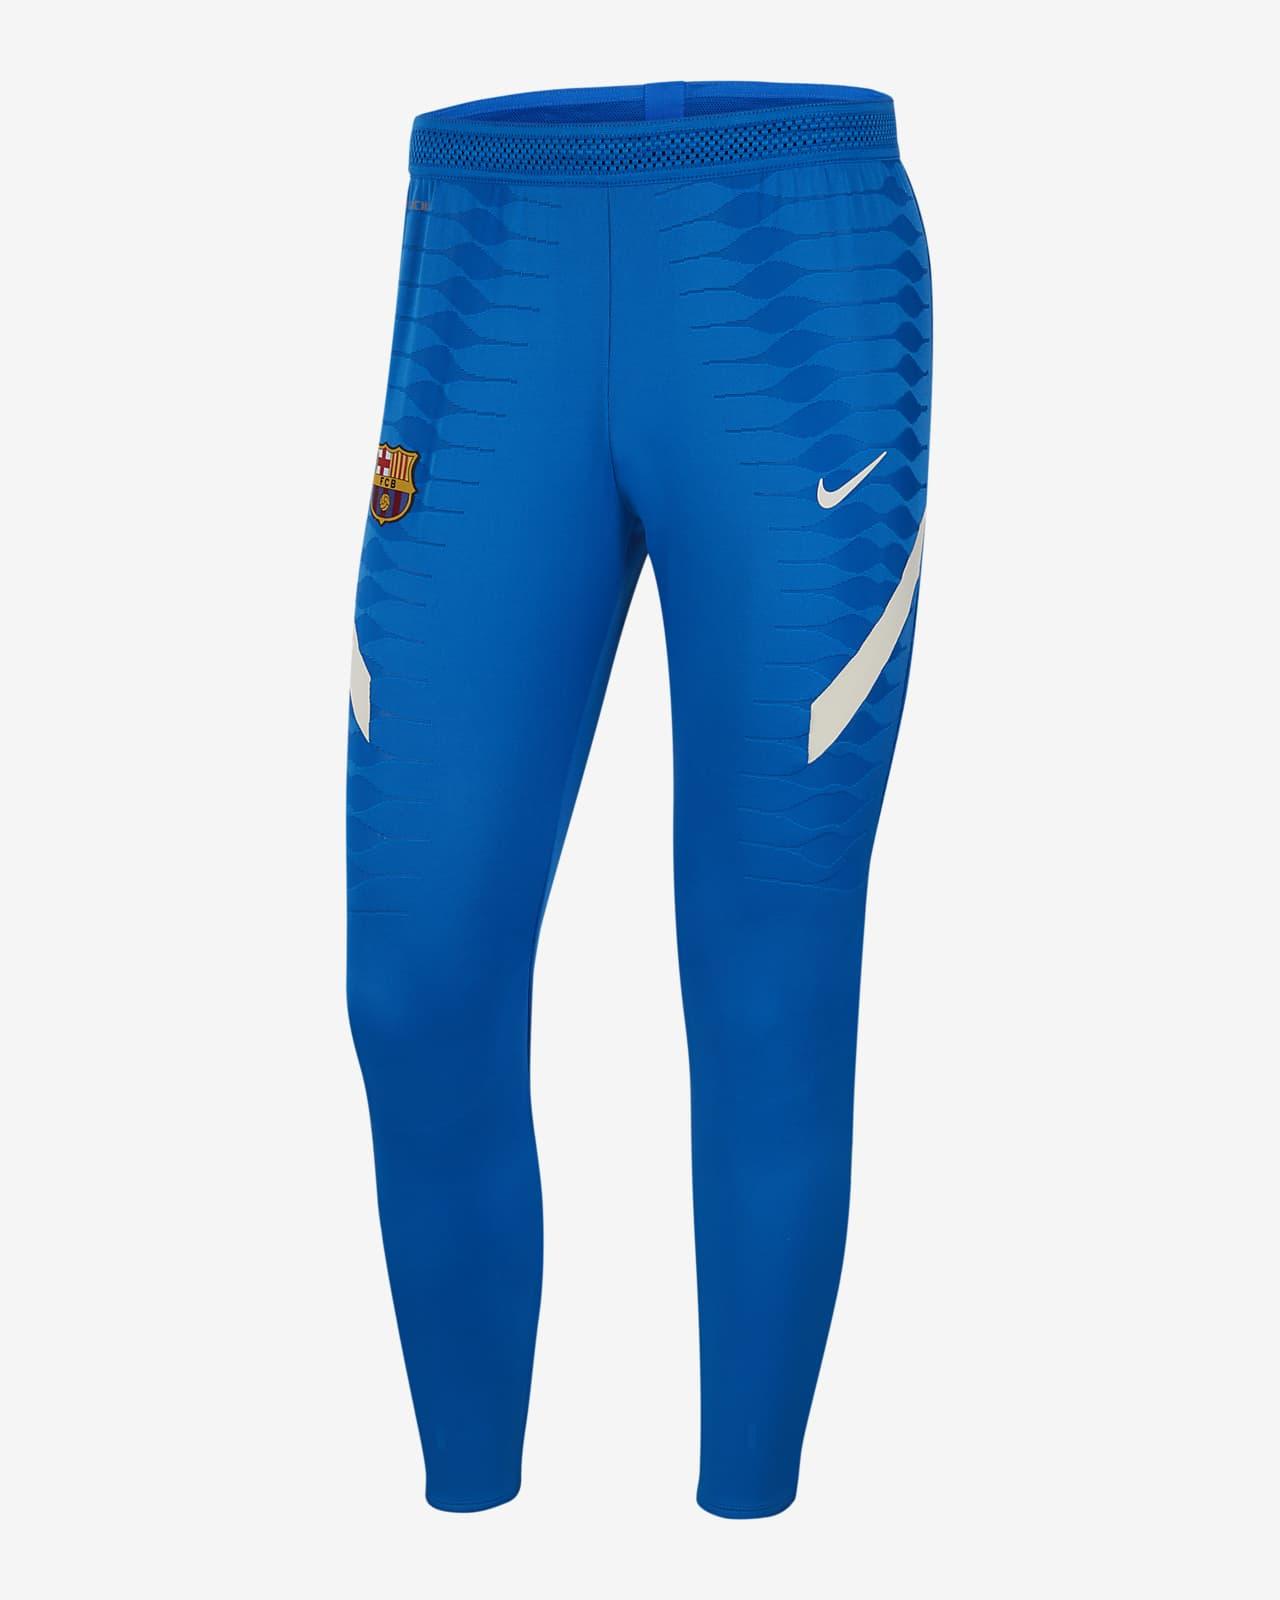 FC Barcelona Strike Elite Nike Dri-FIT ADV Erkek Futbol Eşofman Altı